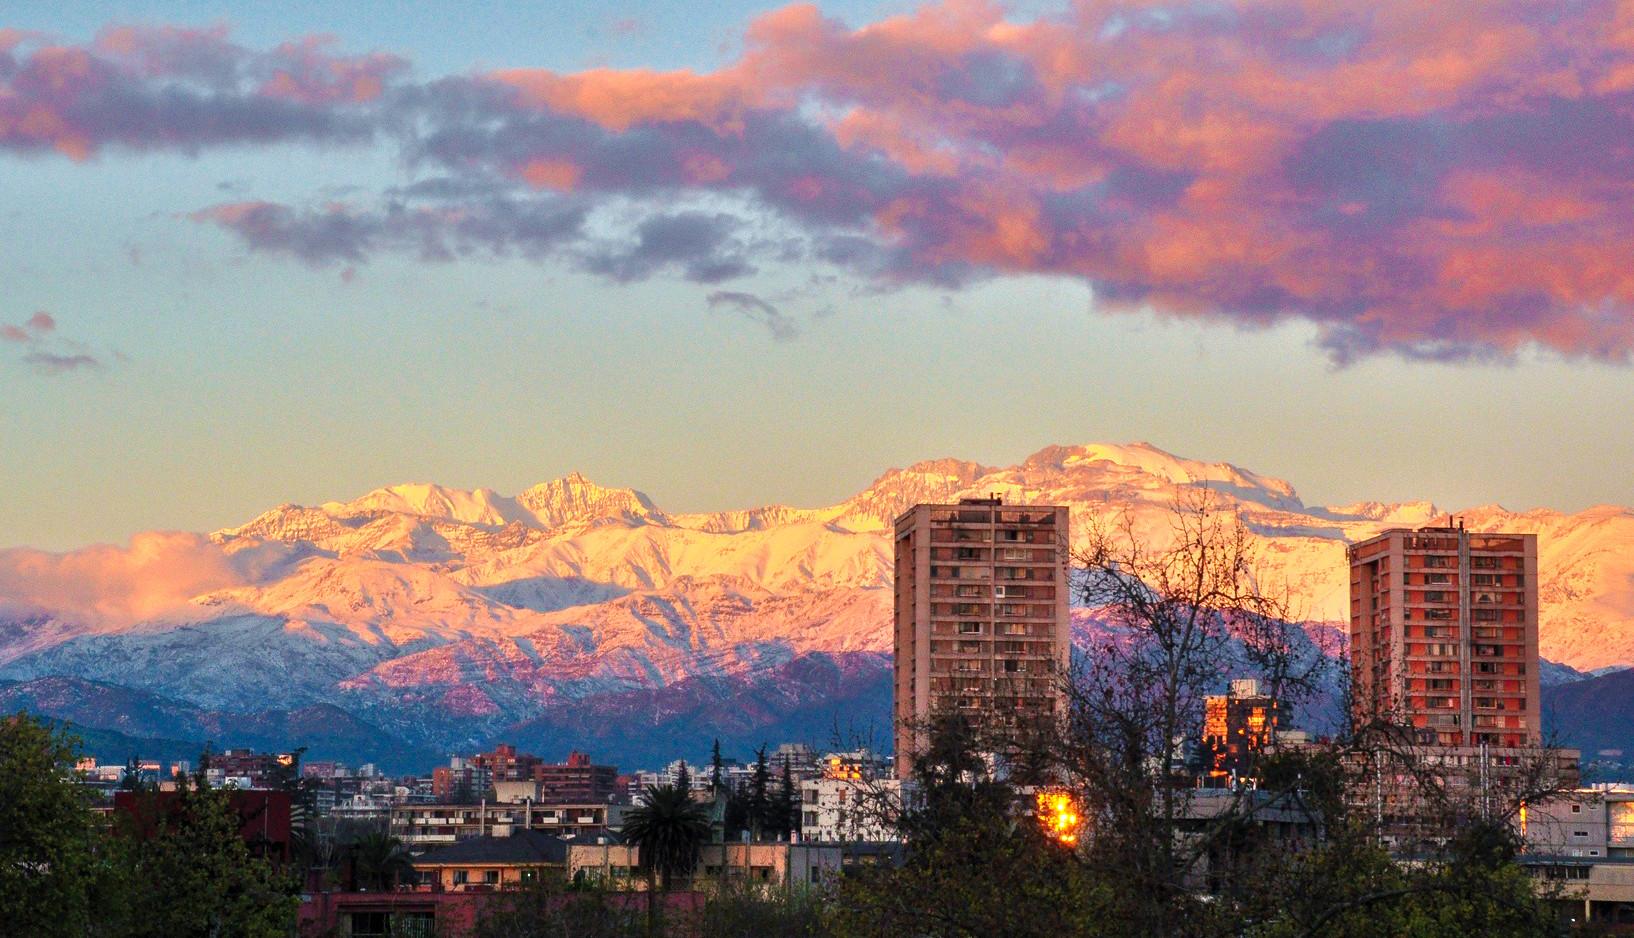 CHILE - SANTIAGO